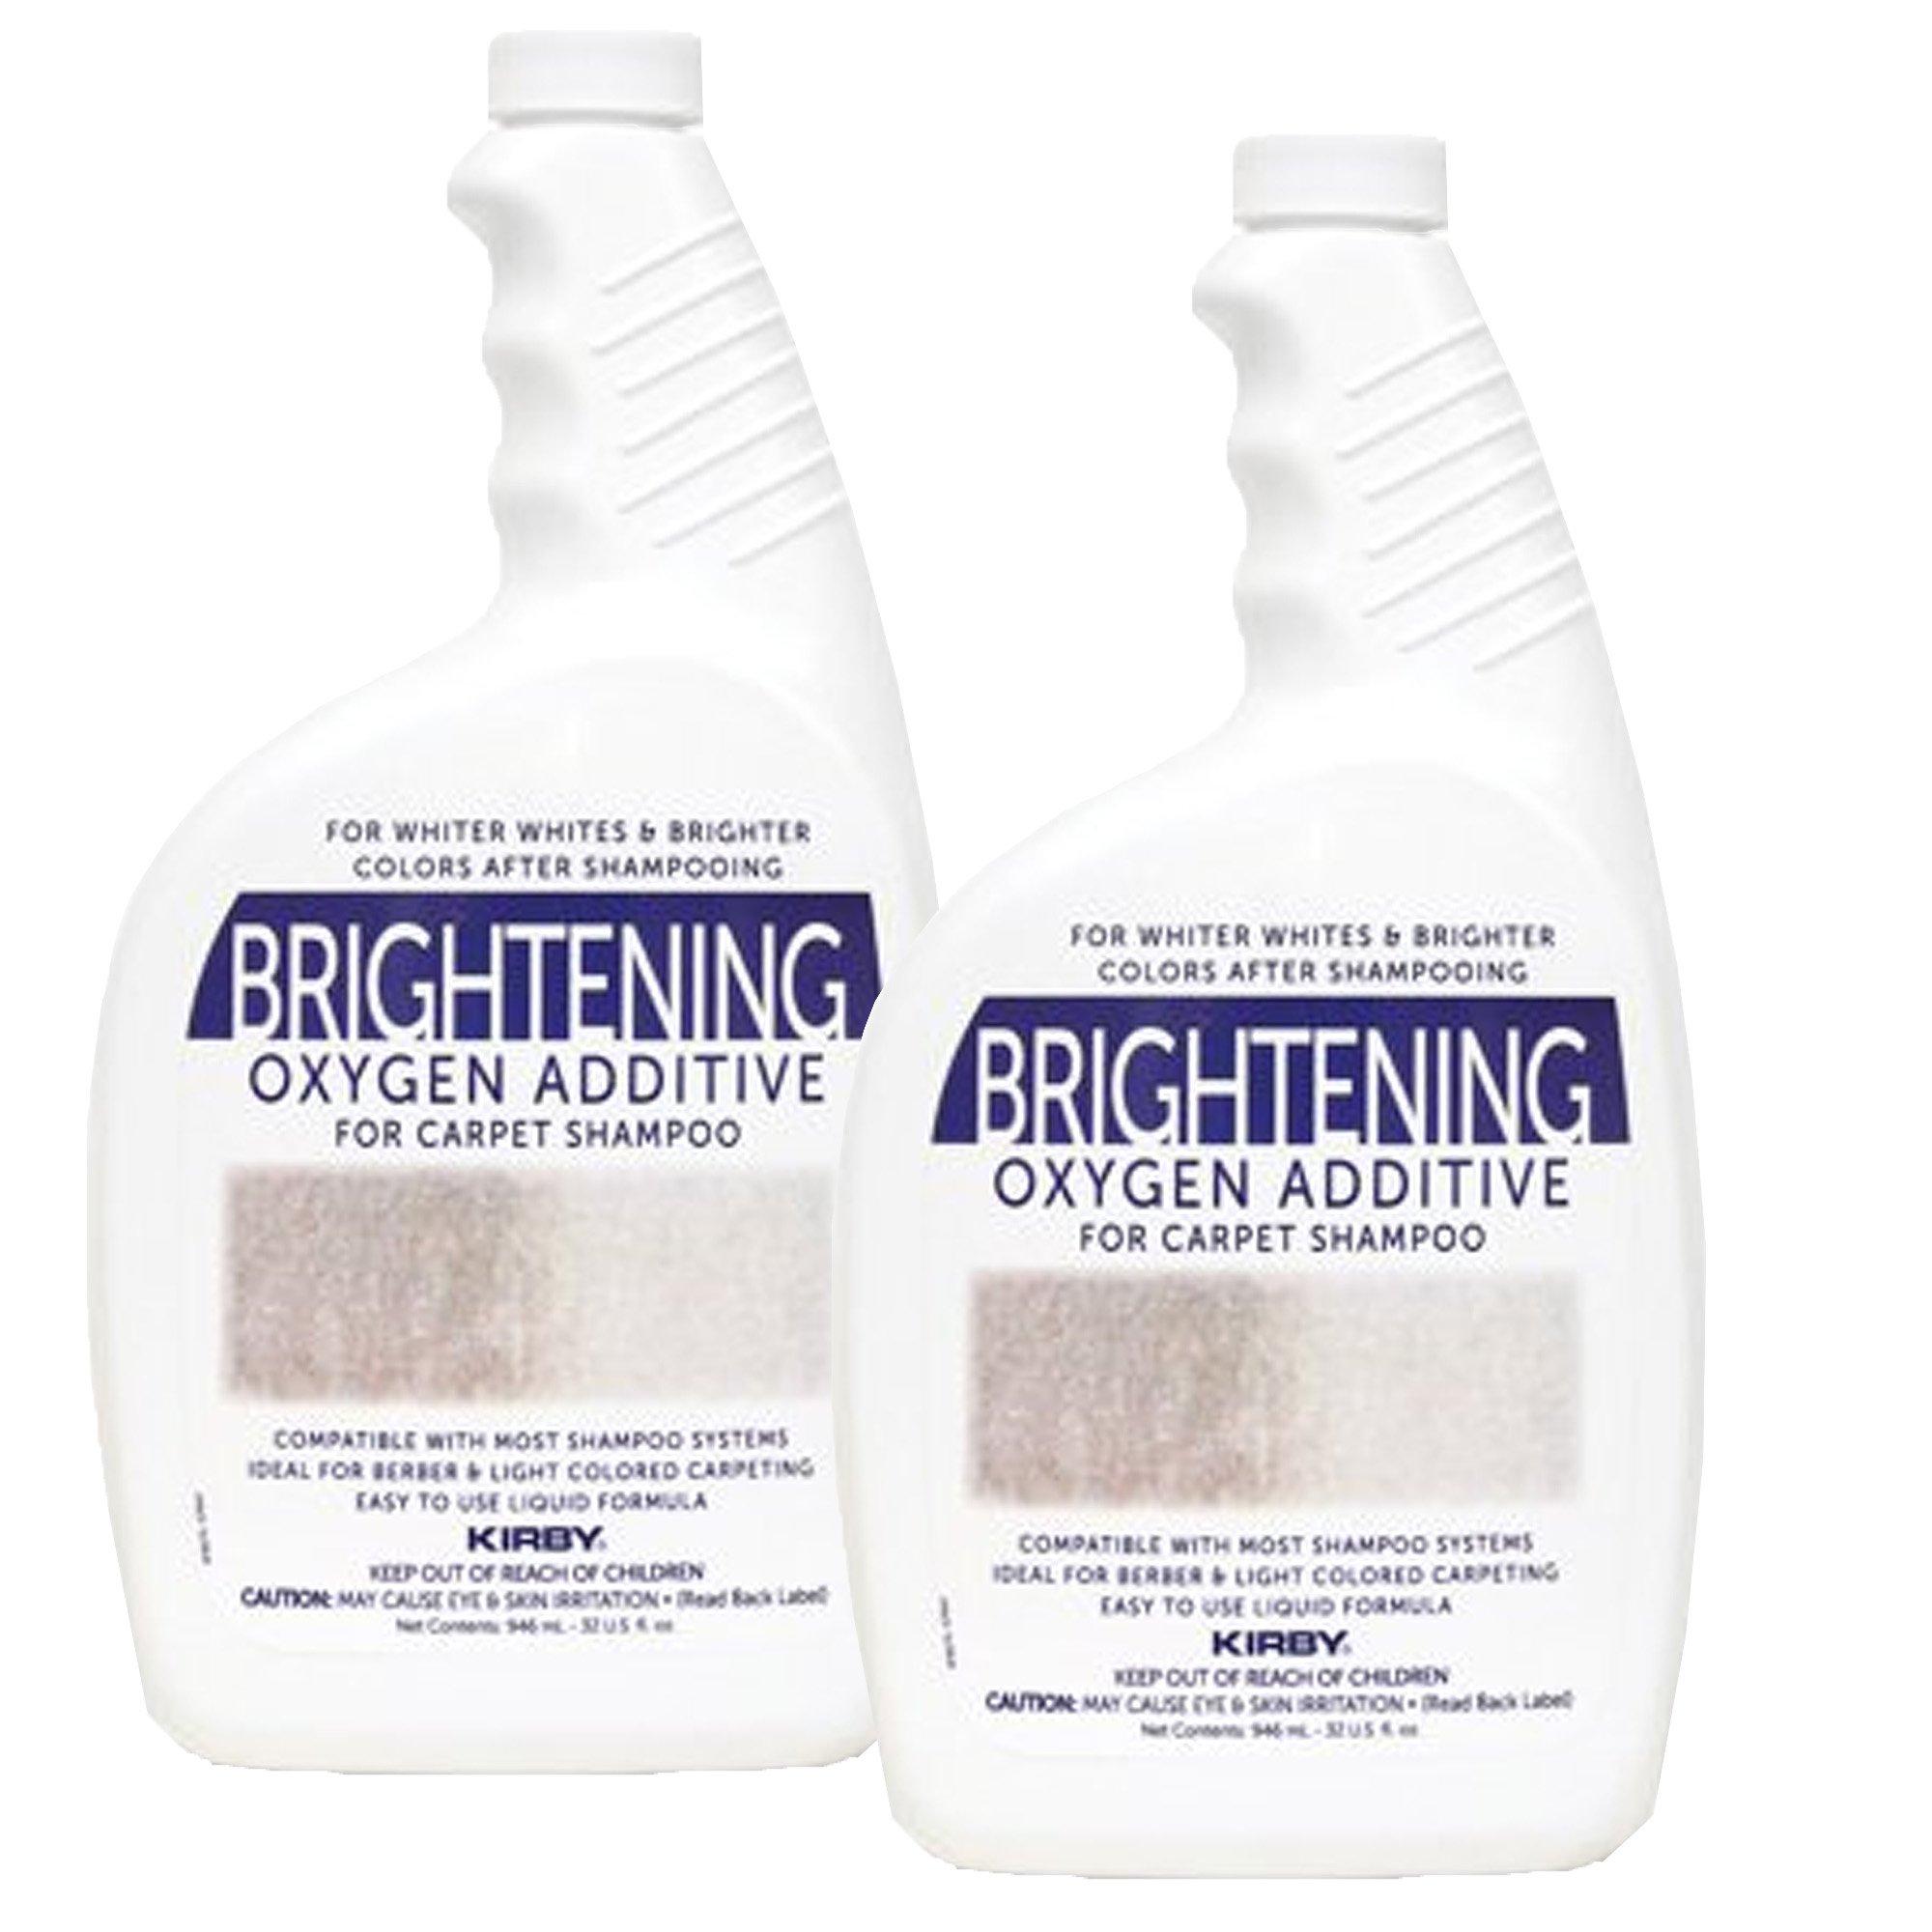 Kirby 32oz. Brightening Oxygen Additive for carpet shampoo (2 bottles) Genuine by Kirby